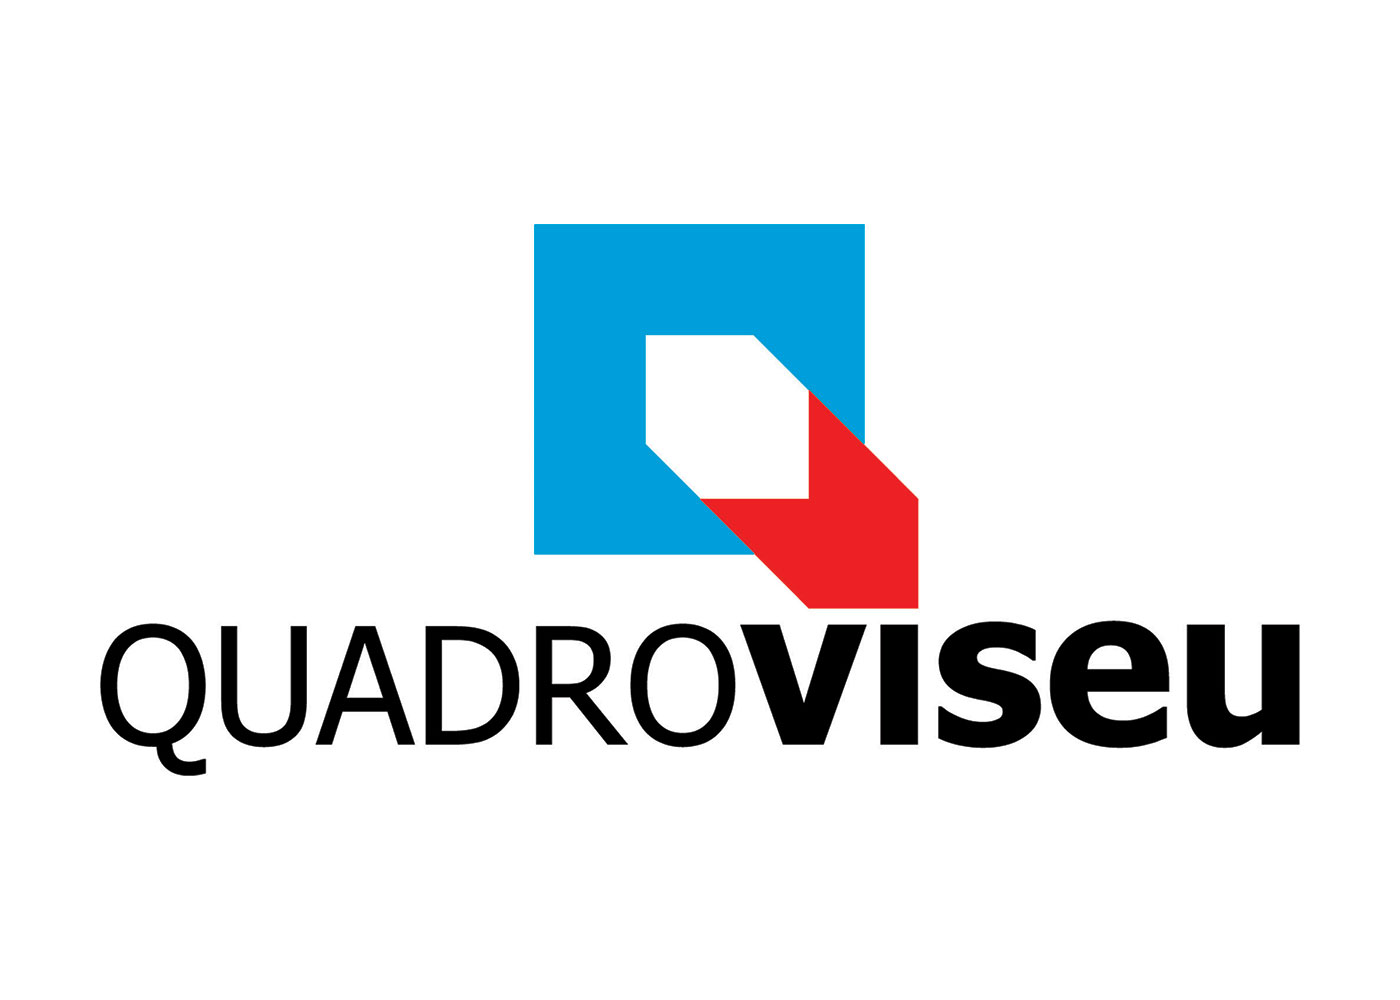 Quadroviseu